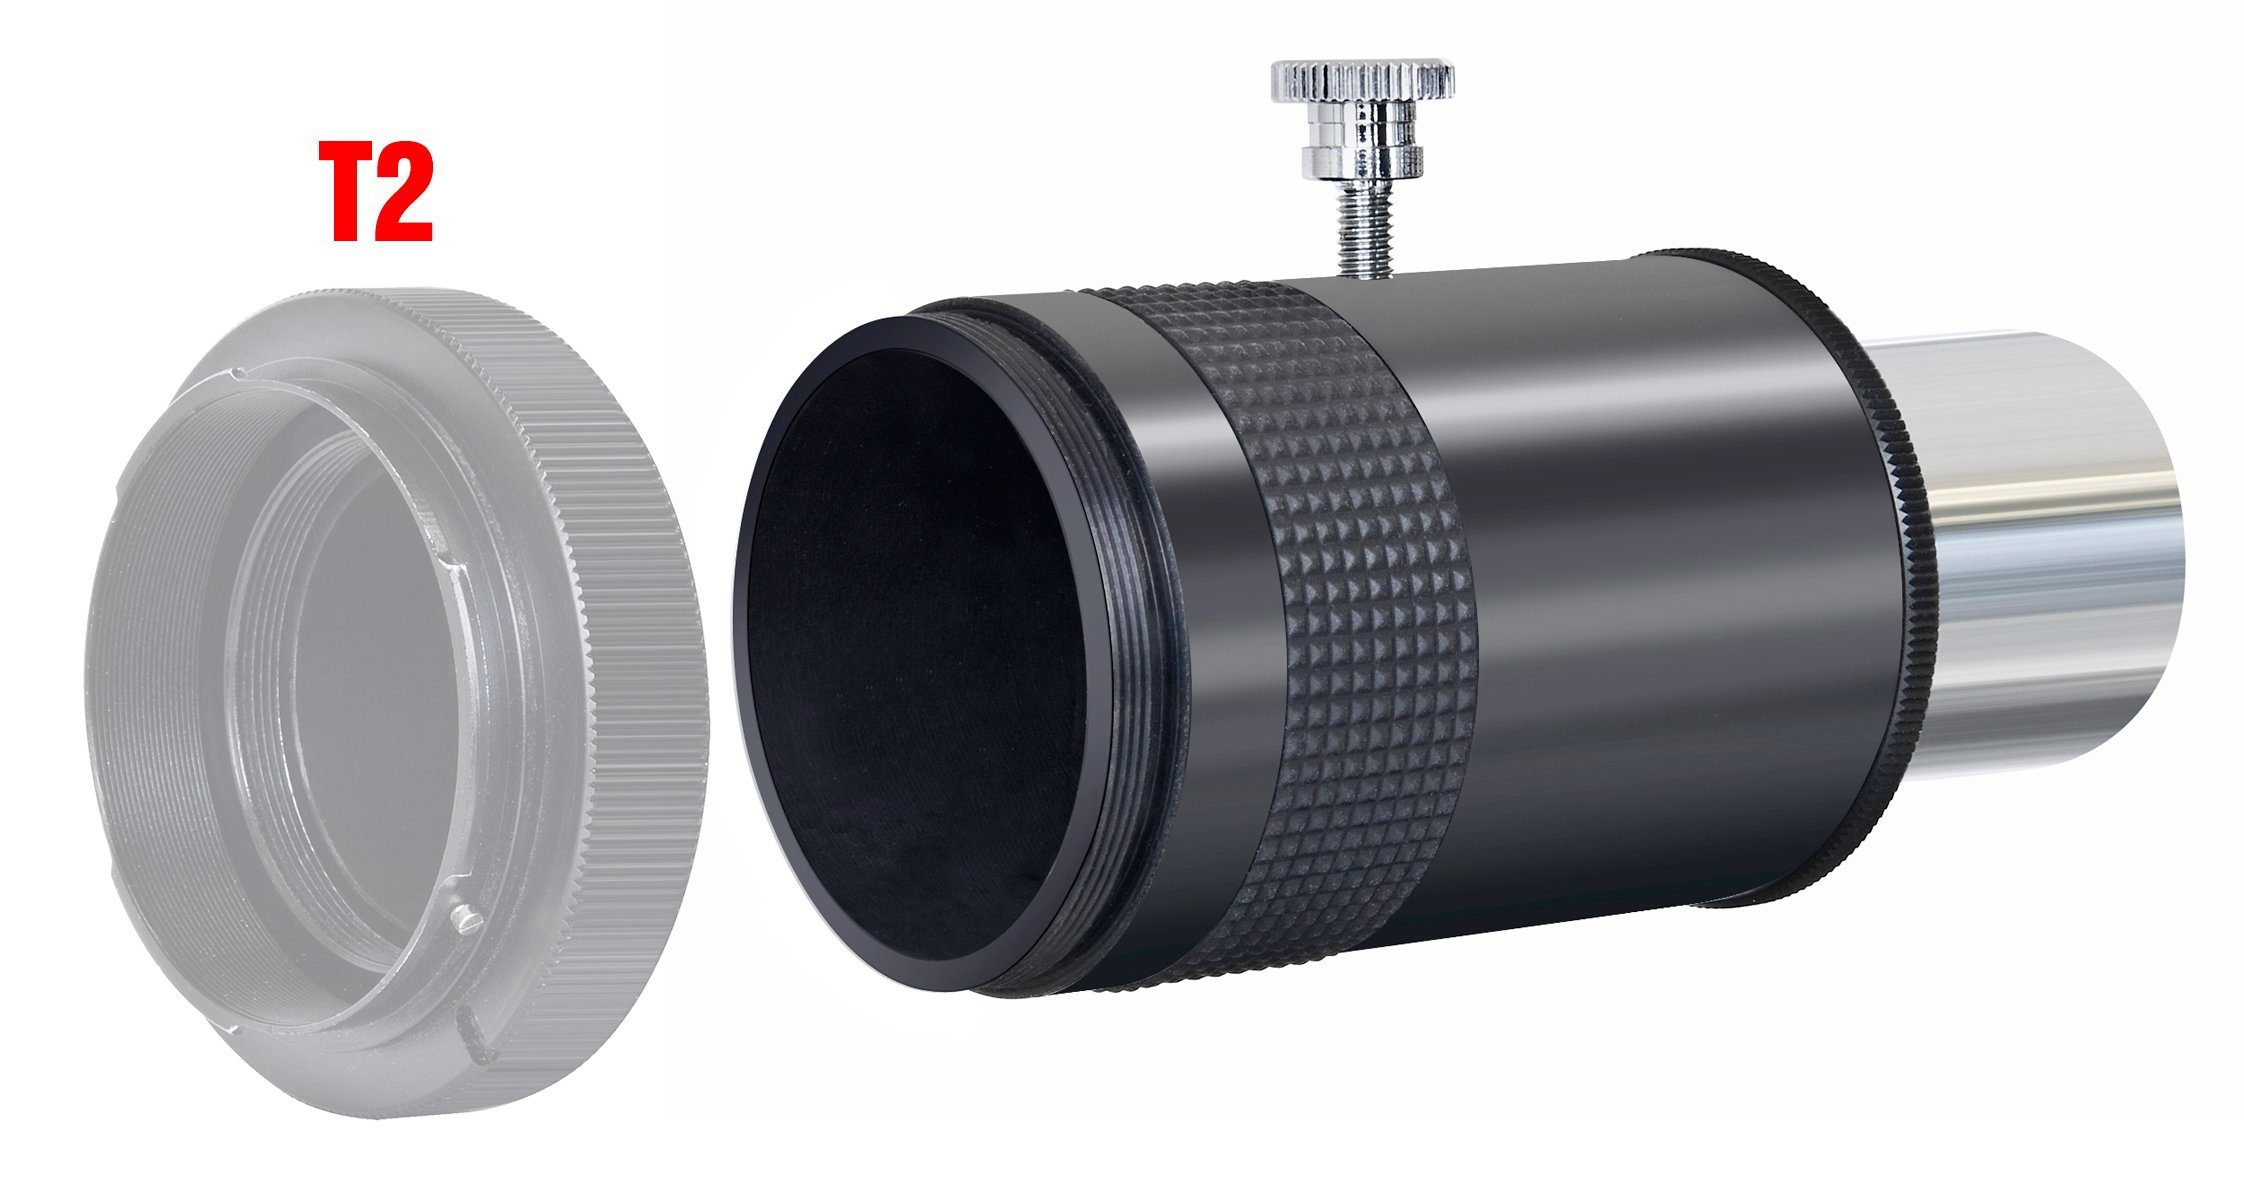 "BRESSER Teleskop »BRESSER Teleskop Kamera-Adapter (1.25"")«"